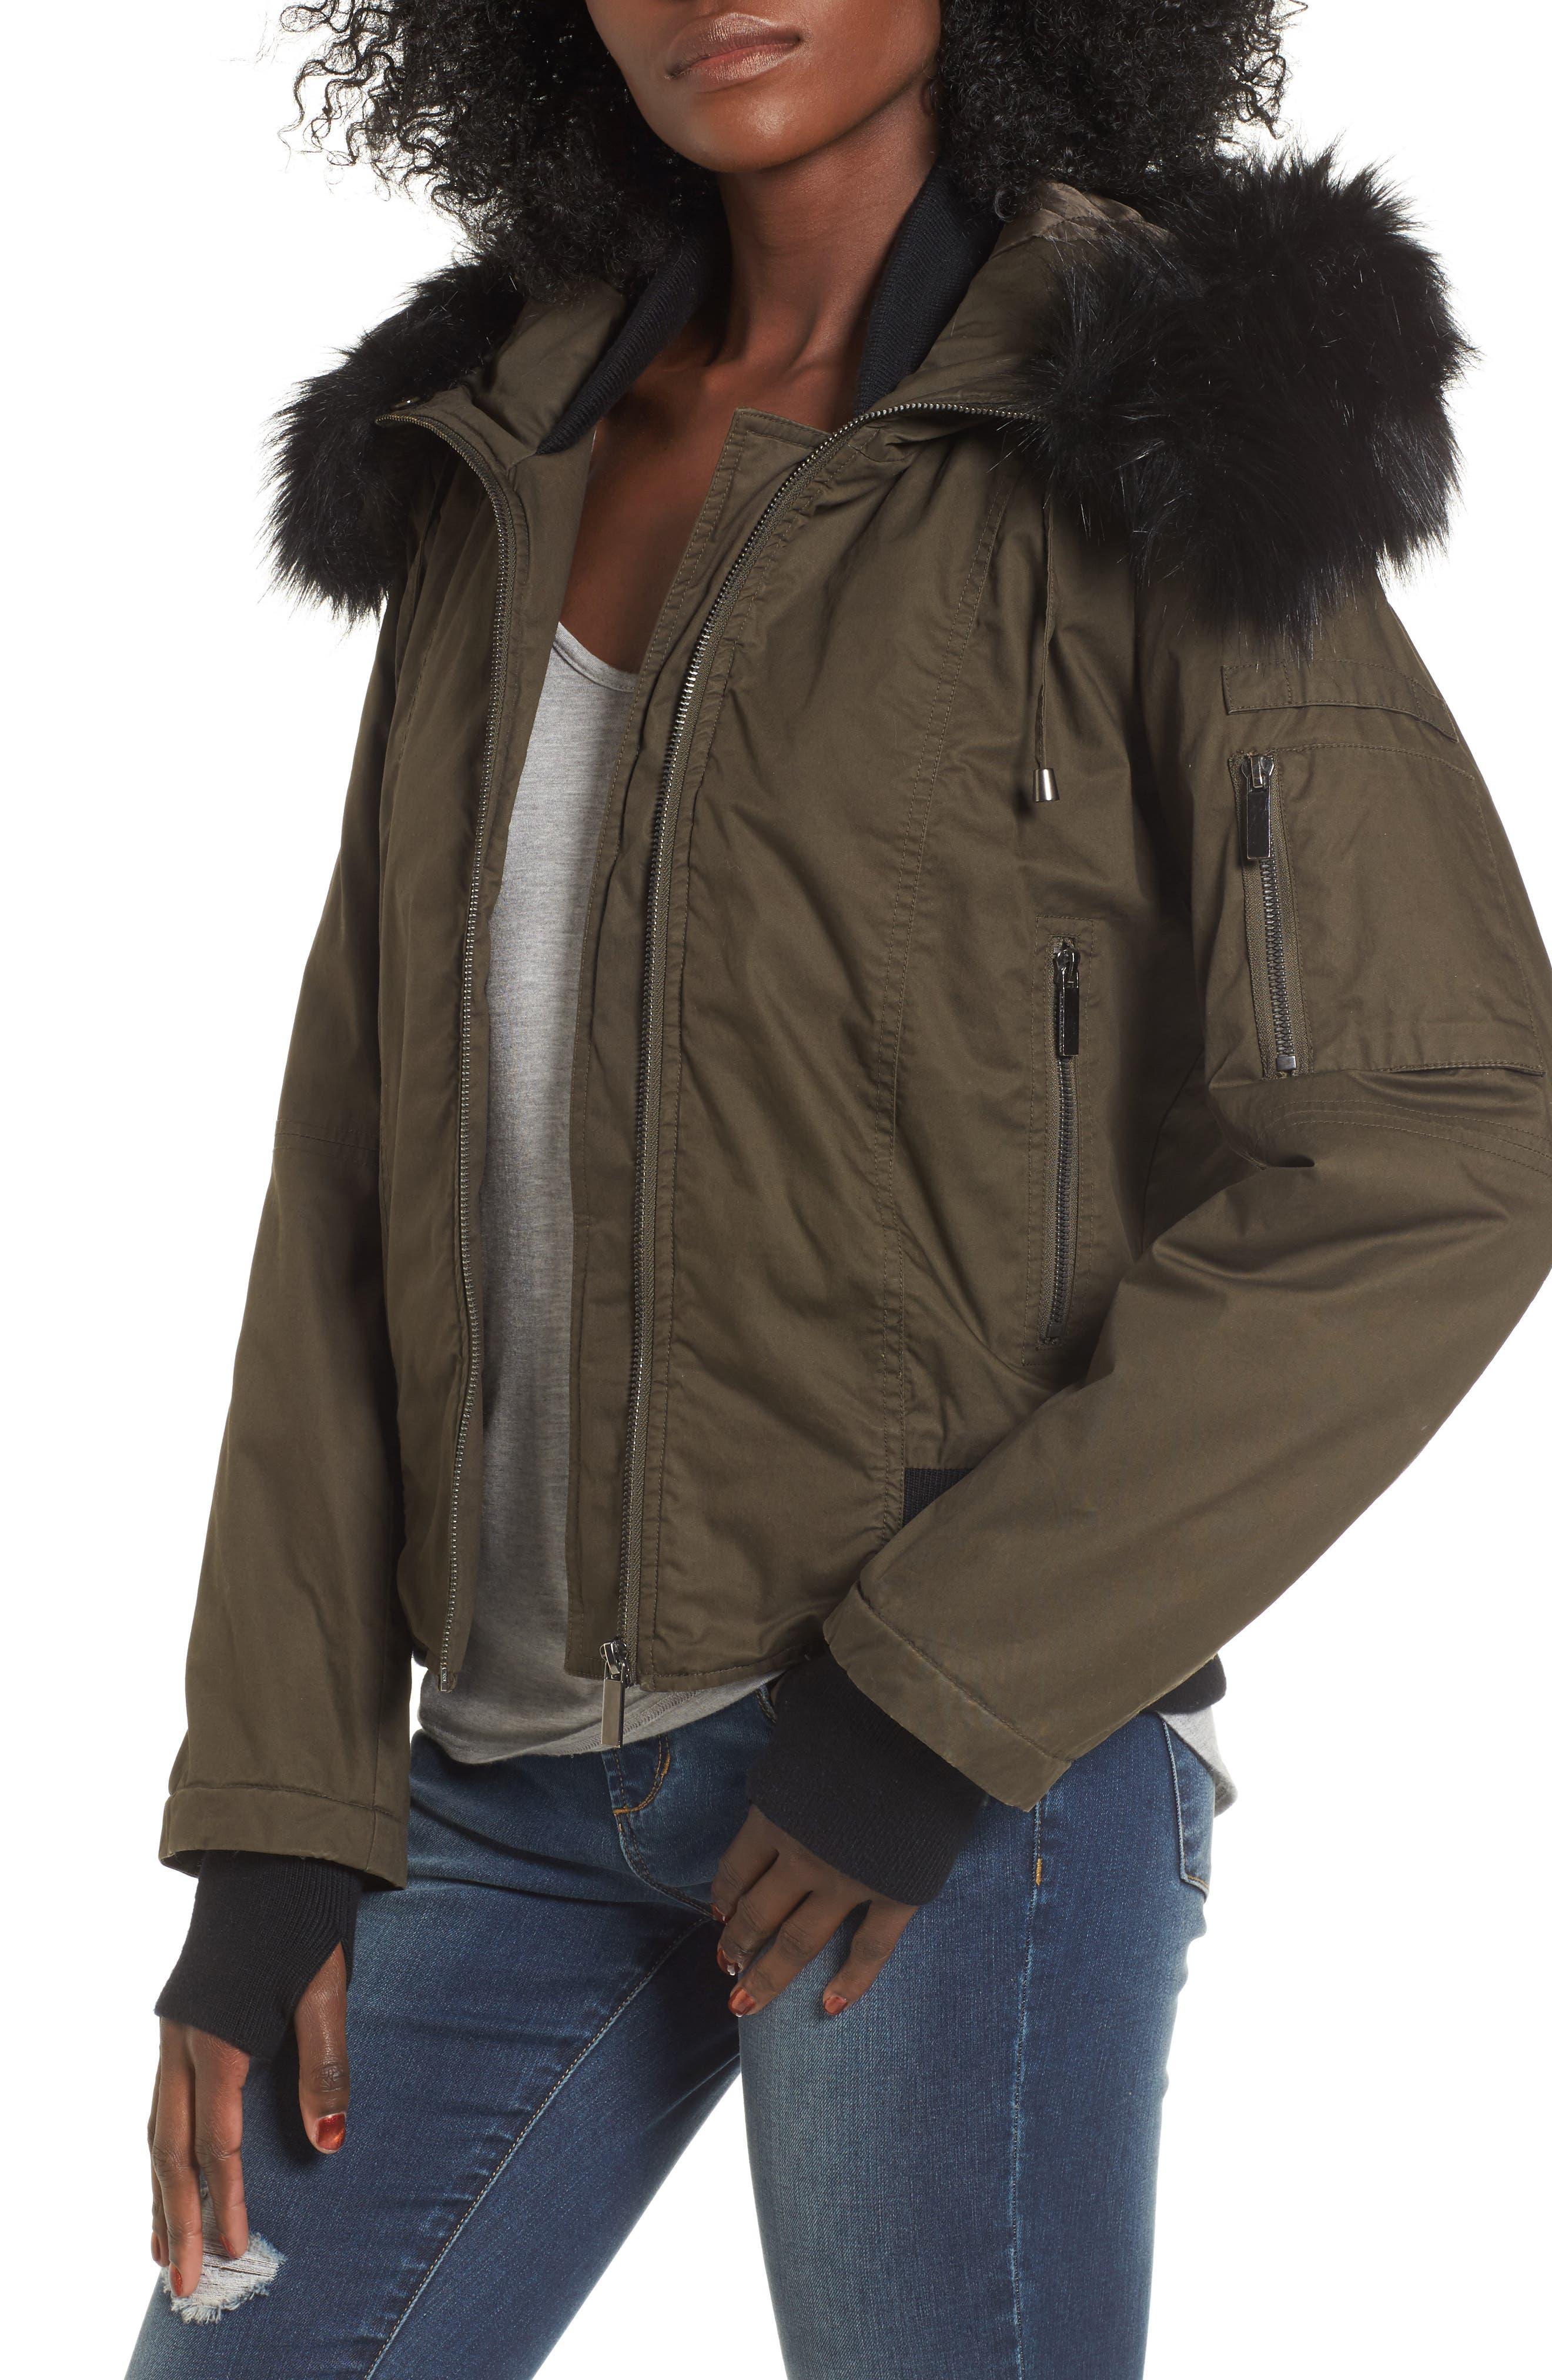 French Connection Faux Fur Trim Wax Cotton Bomber Jacket